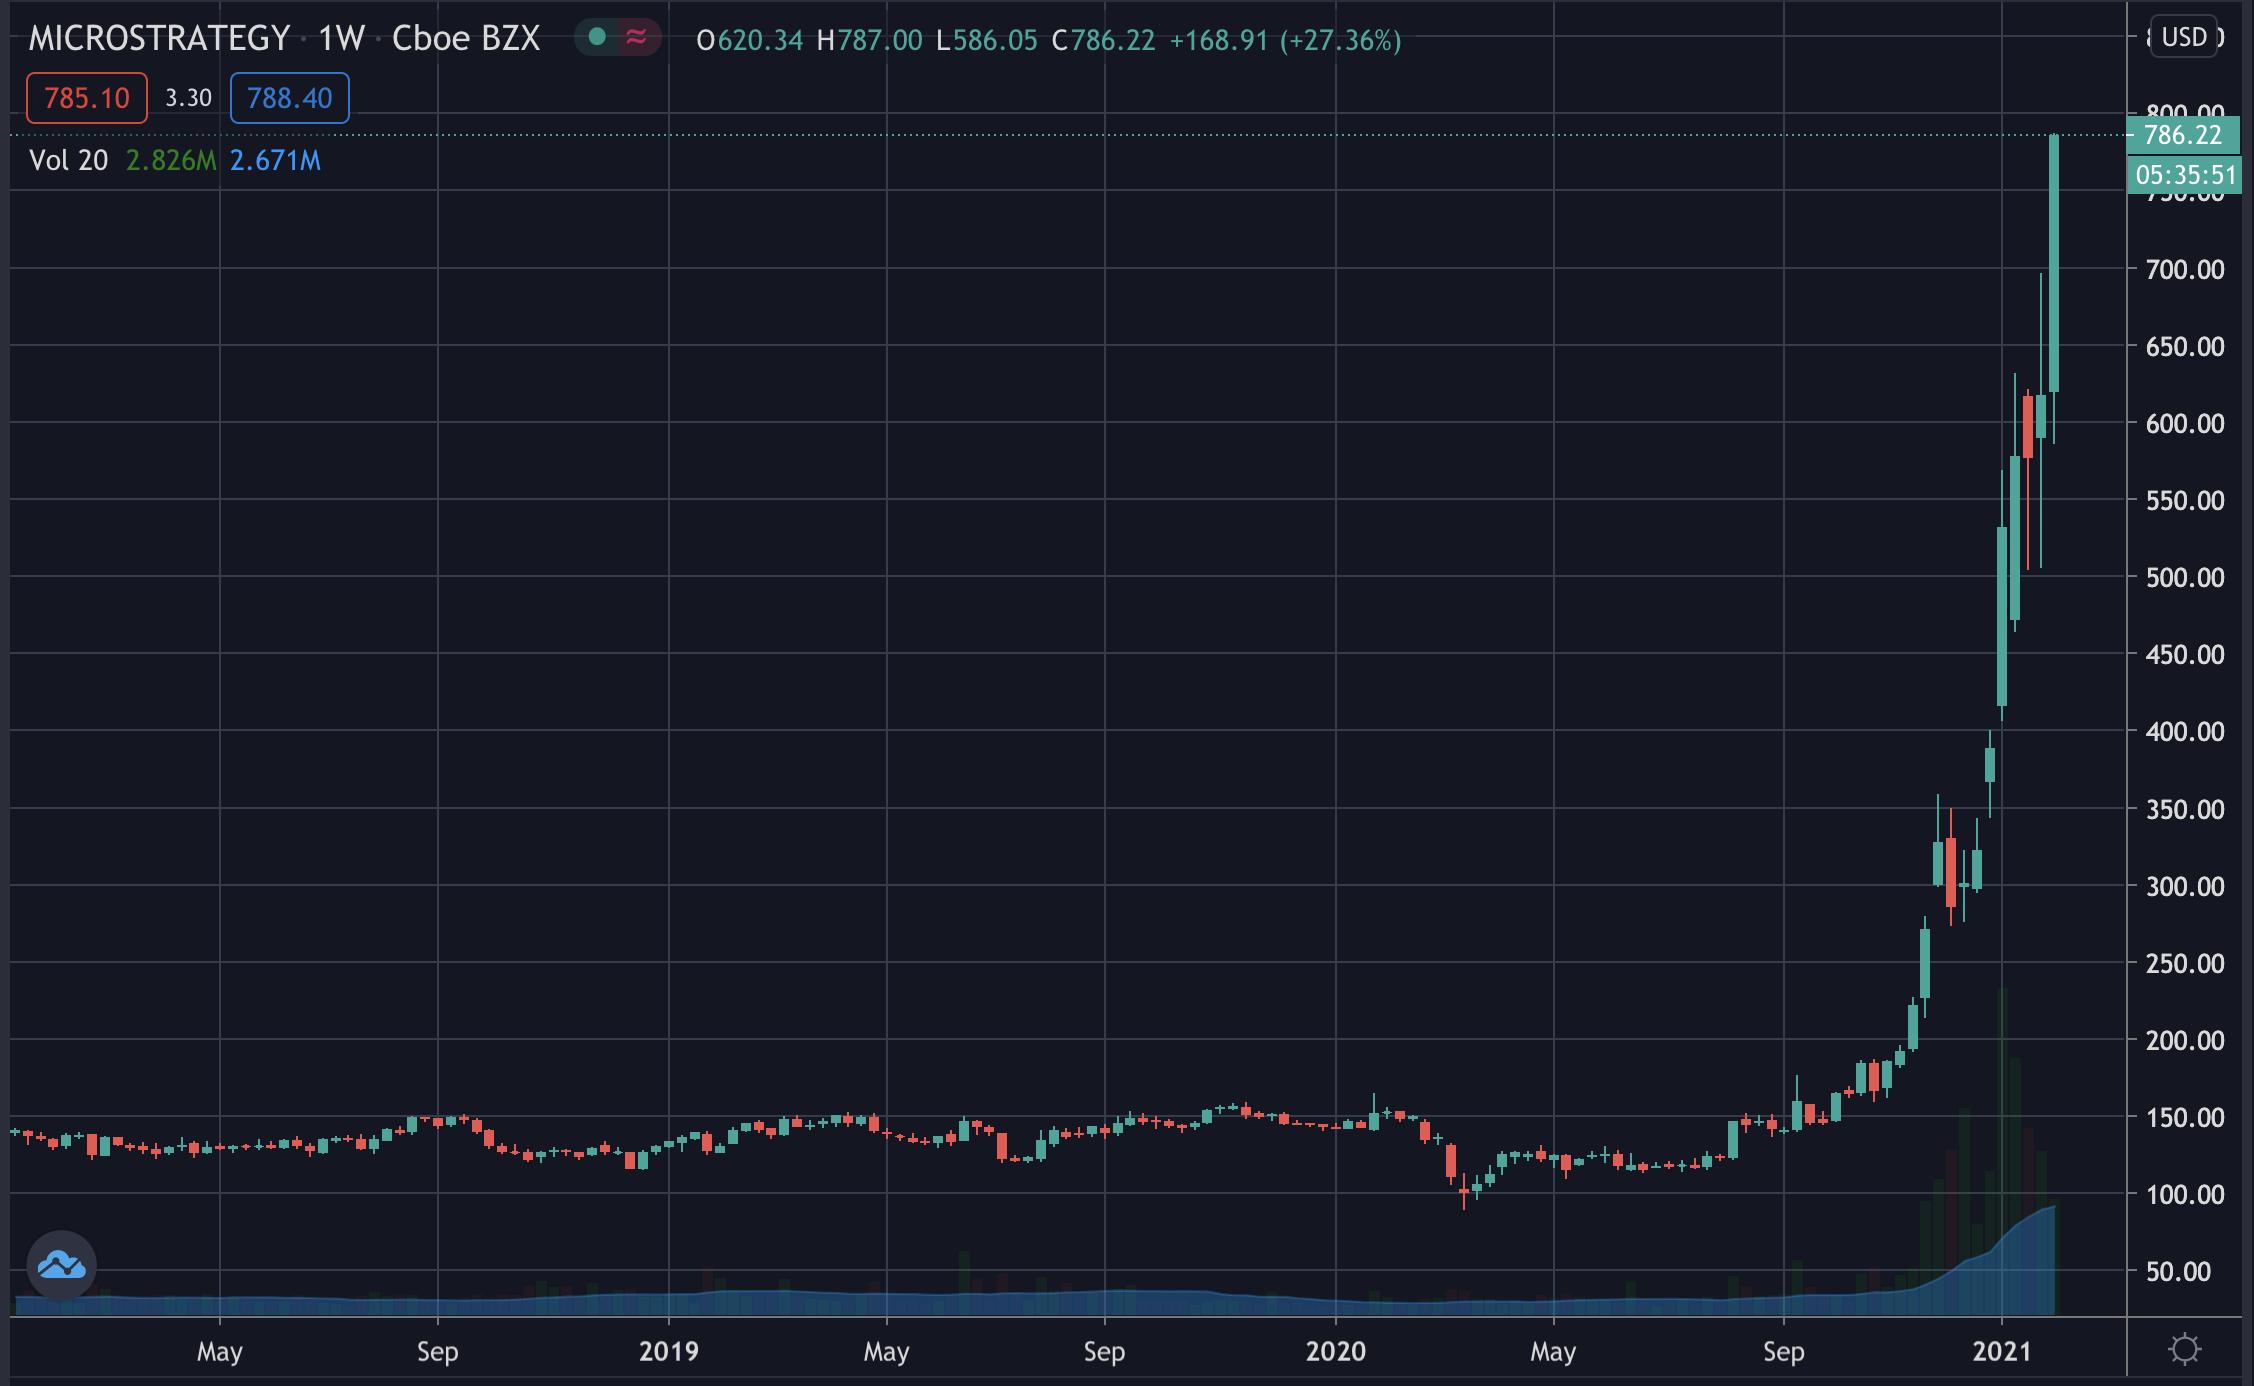 MicroStrategy's price, Feb 2021